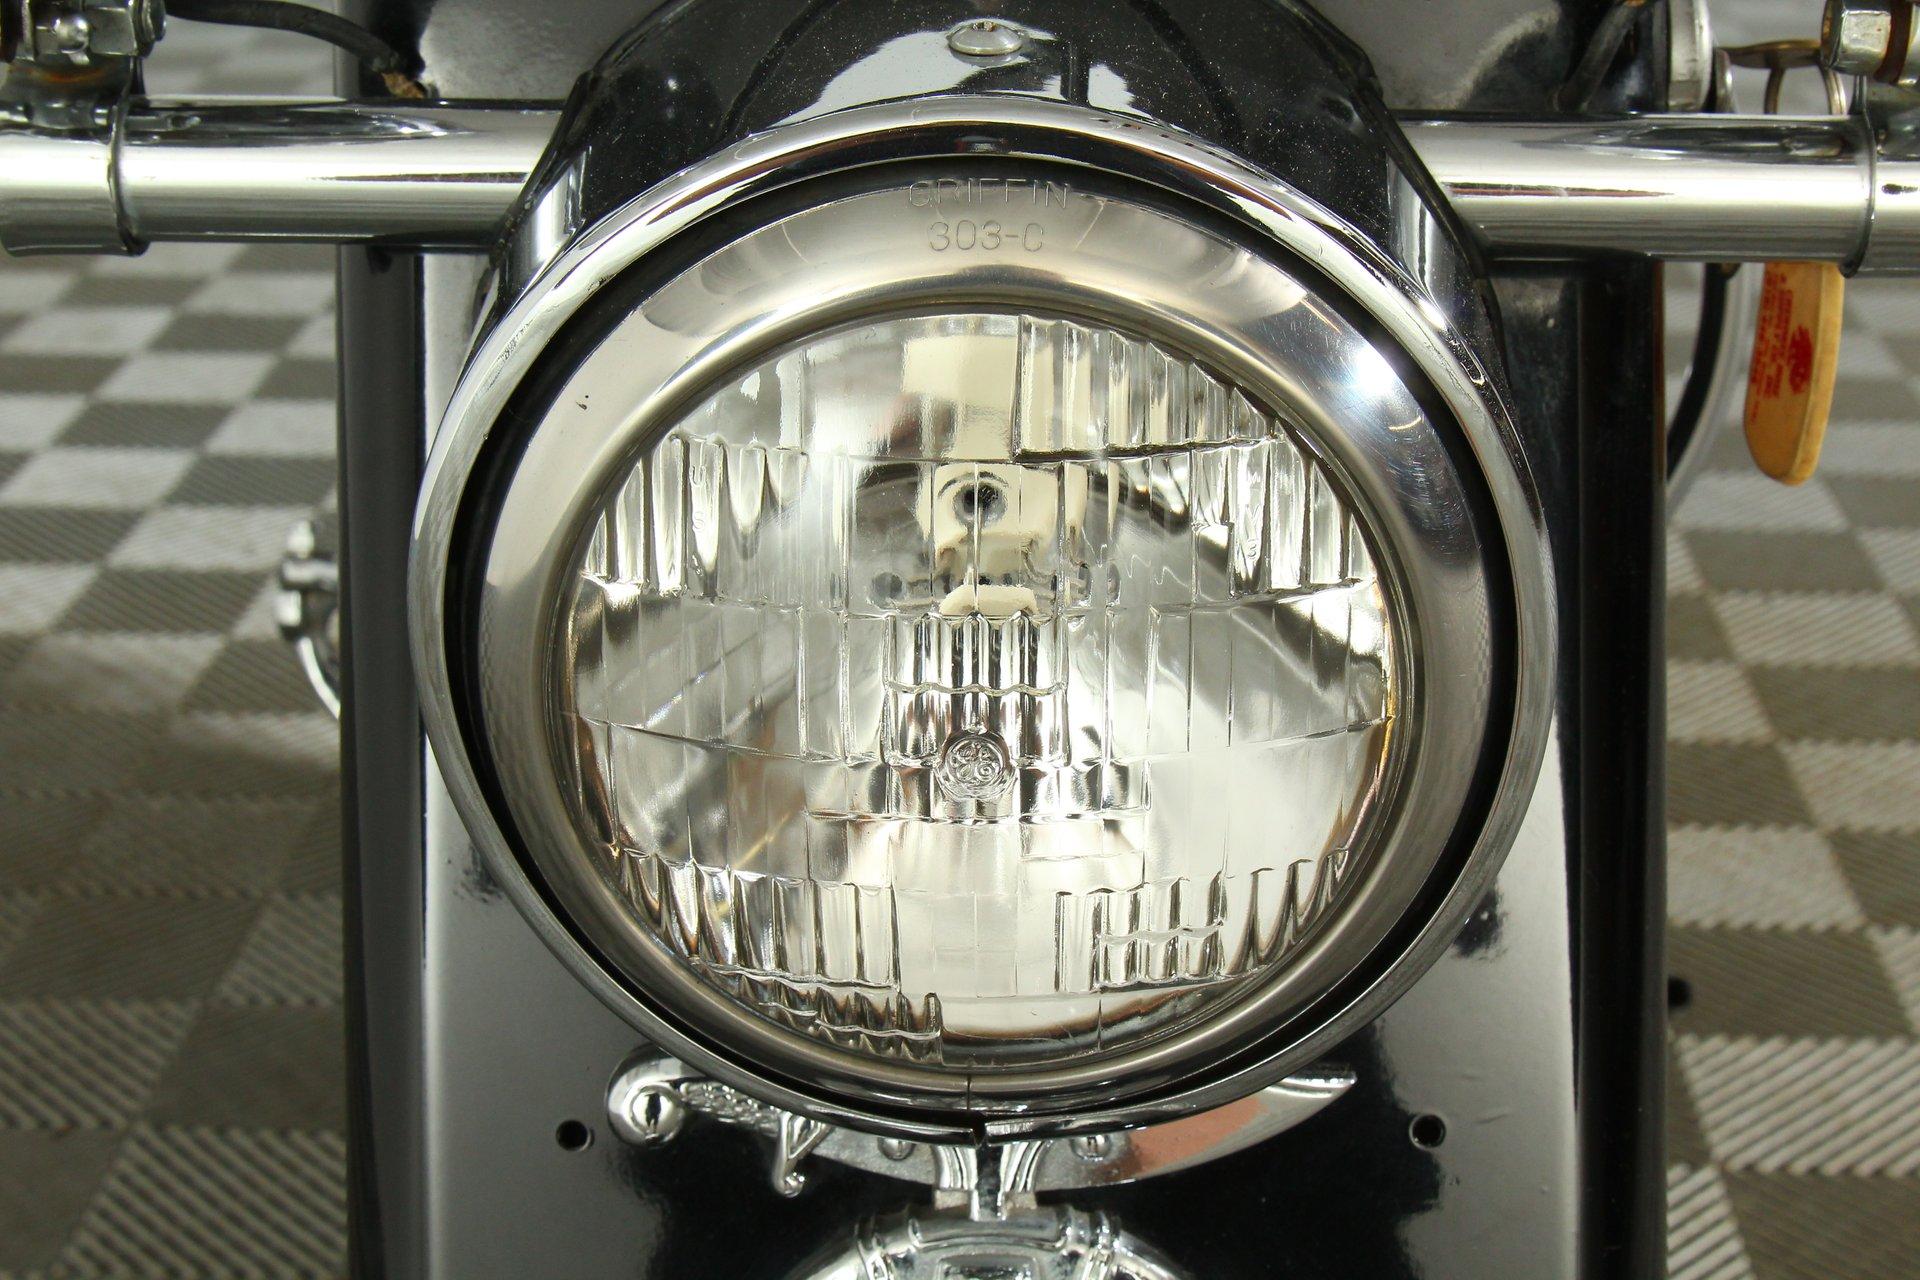 1964 Cushman Scooter